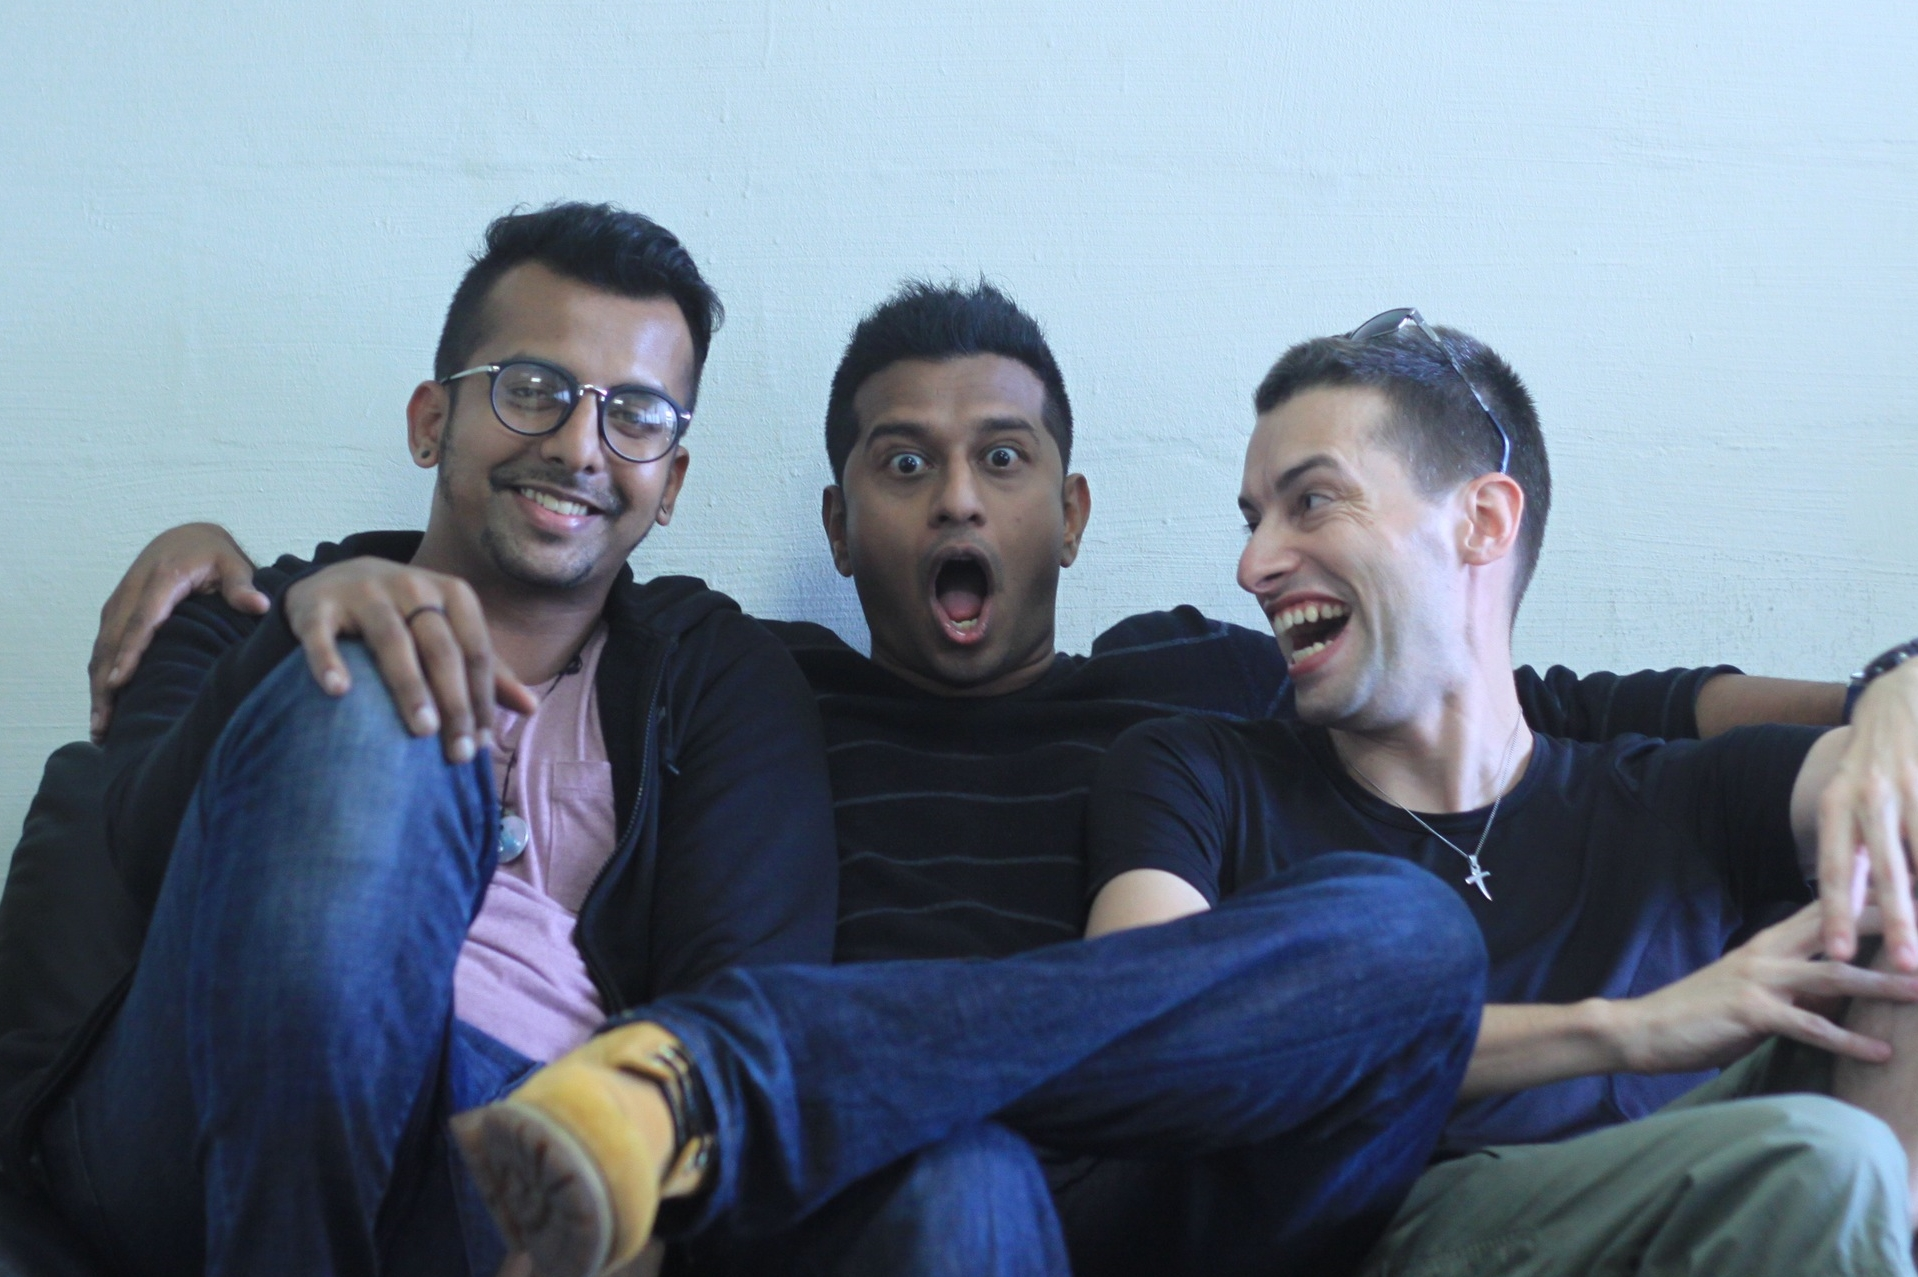 The production team of  Nur Ainun : Jegan Mellam (1. AD), Devarajan Varadarjan (Director), Jerry Koedding (Producer)